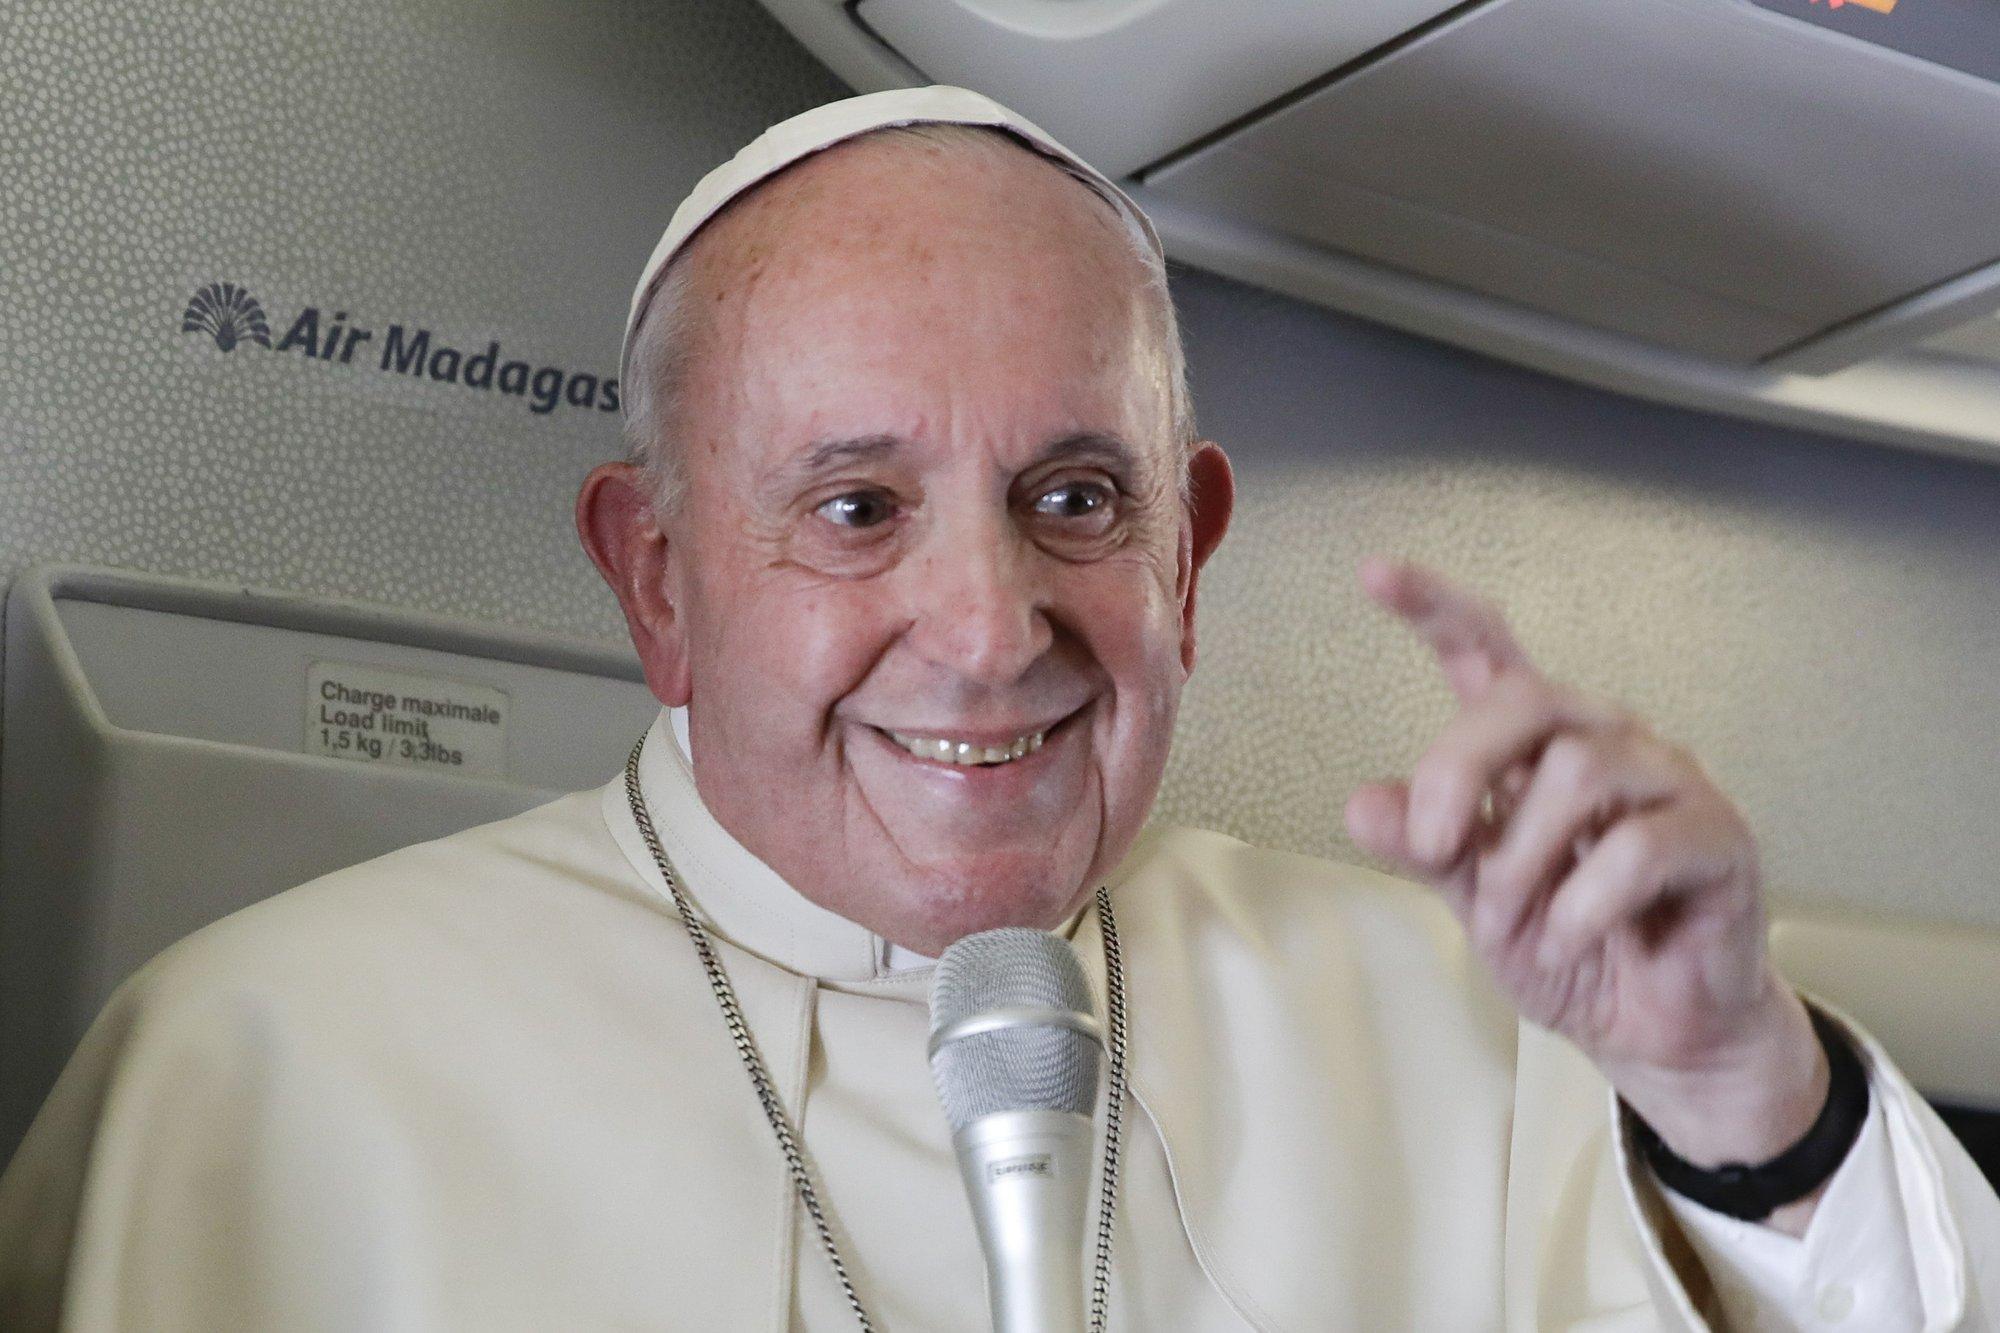 Pope says US critics use 'rigid' ideology' to mask failings